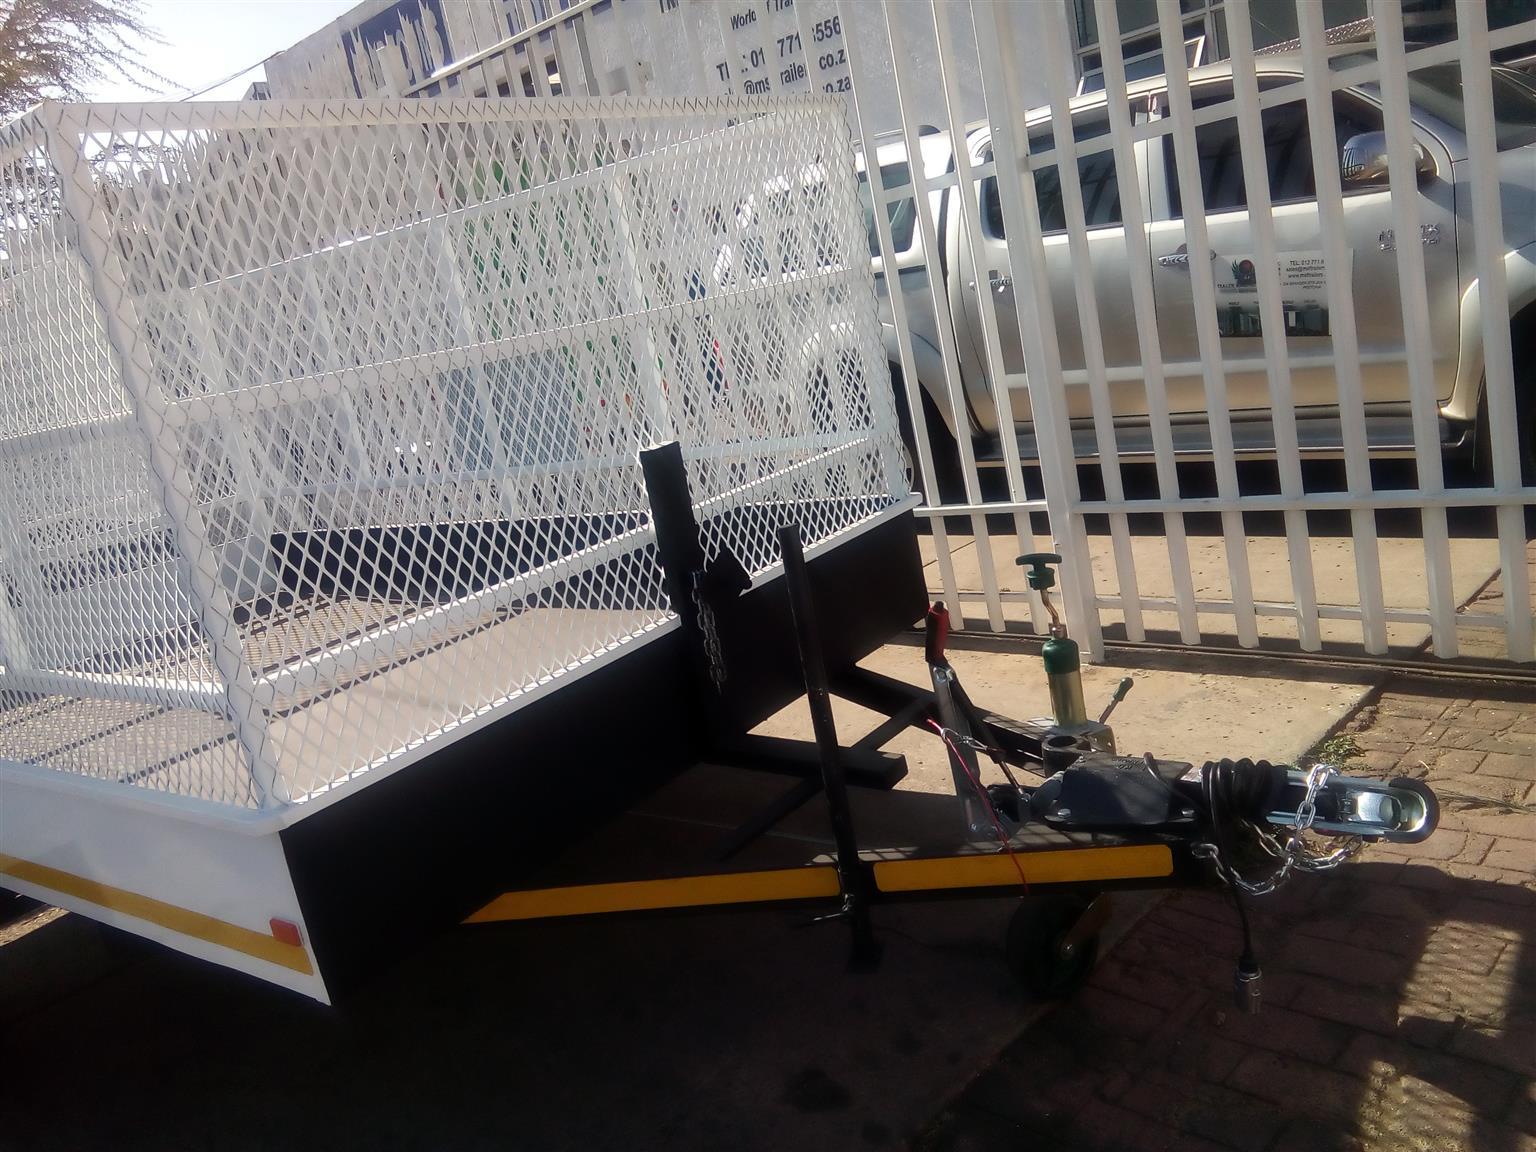 luggage/utility trailers